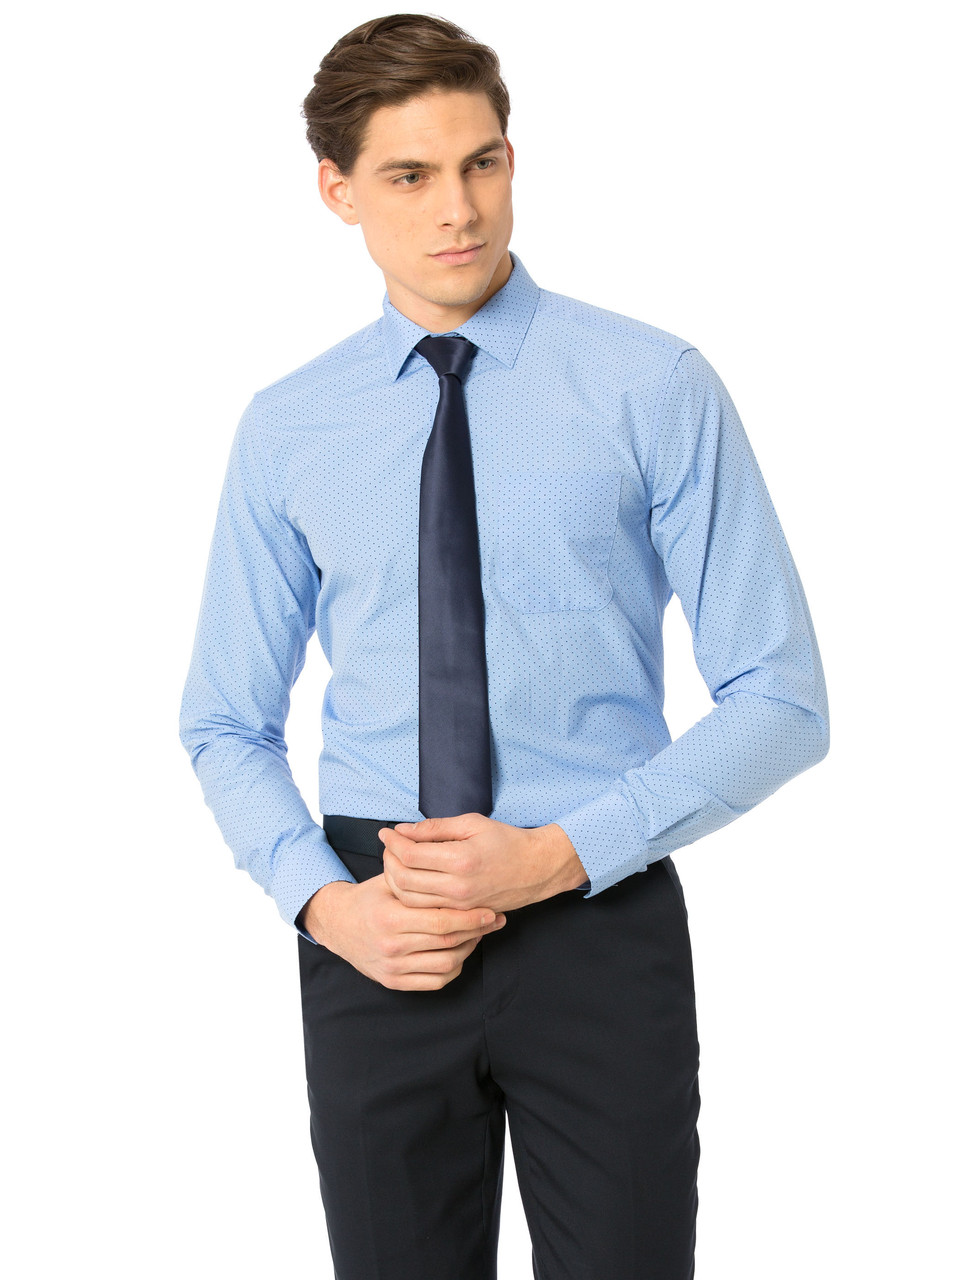 Голубая мужская рубашка LC Waikiki / ЛС Вайкики в синюю точку, с карманом на груди